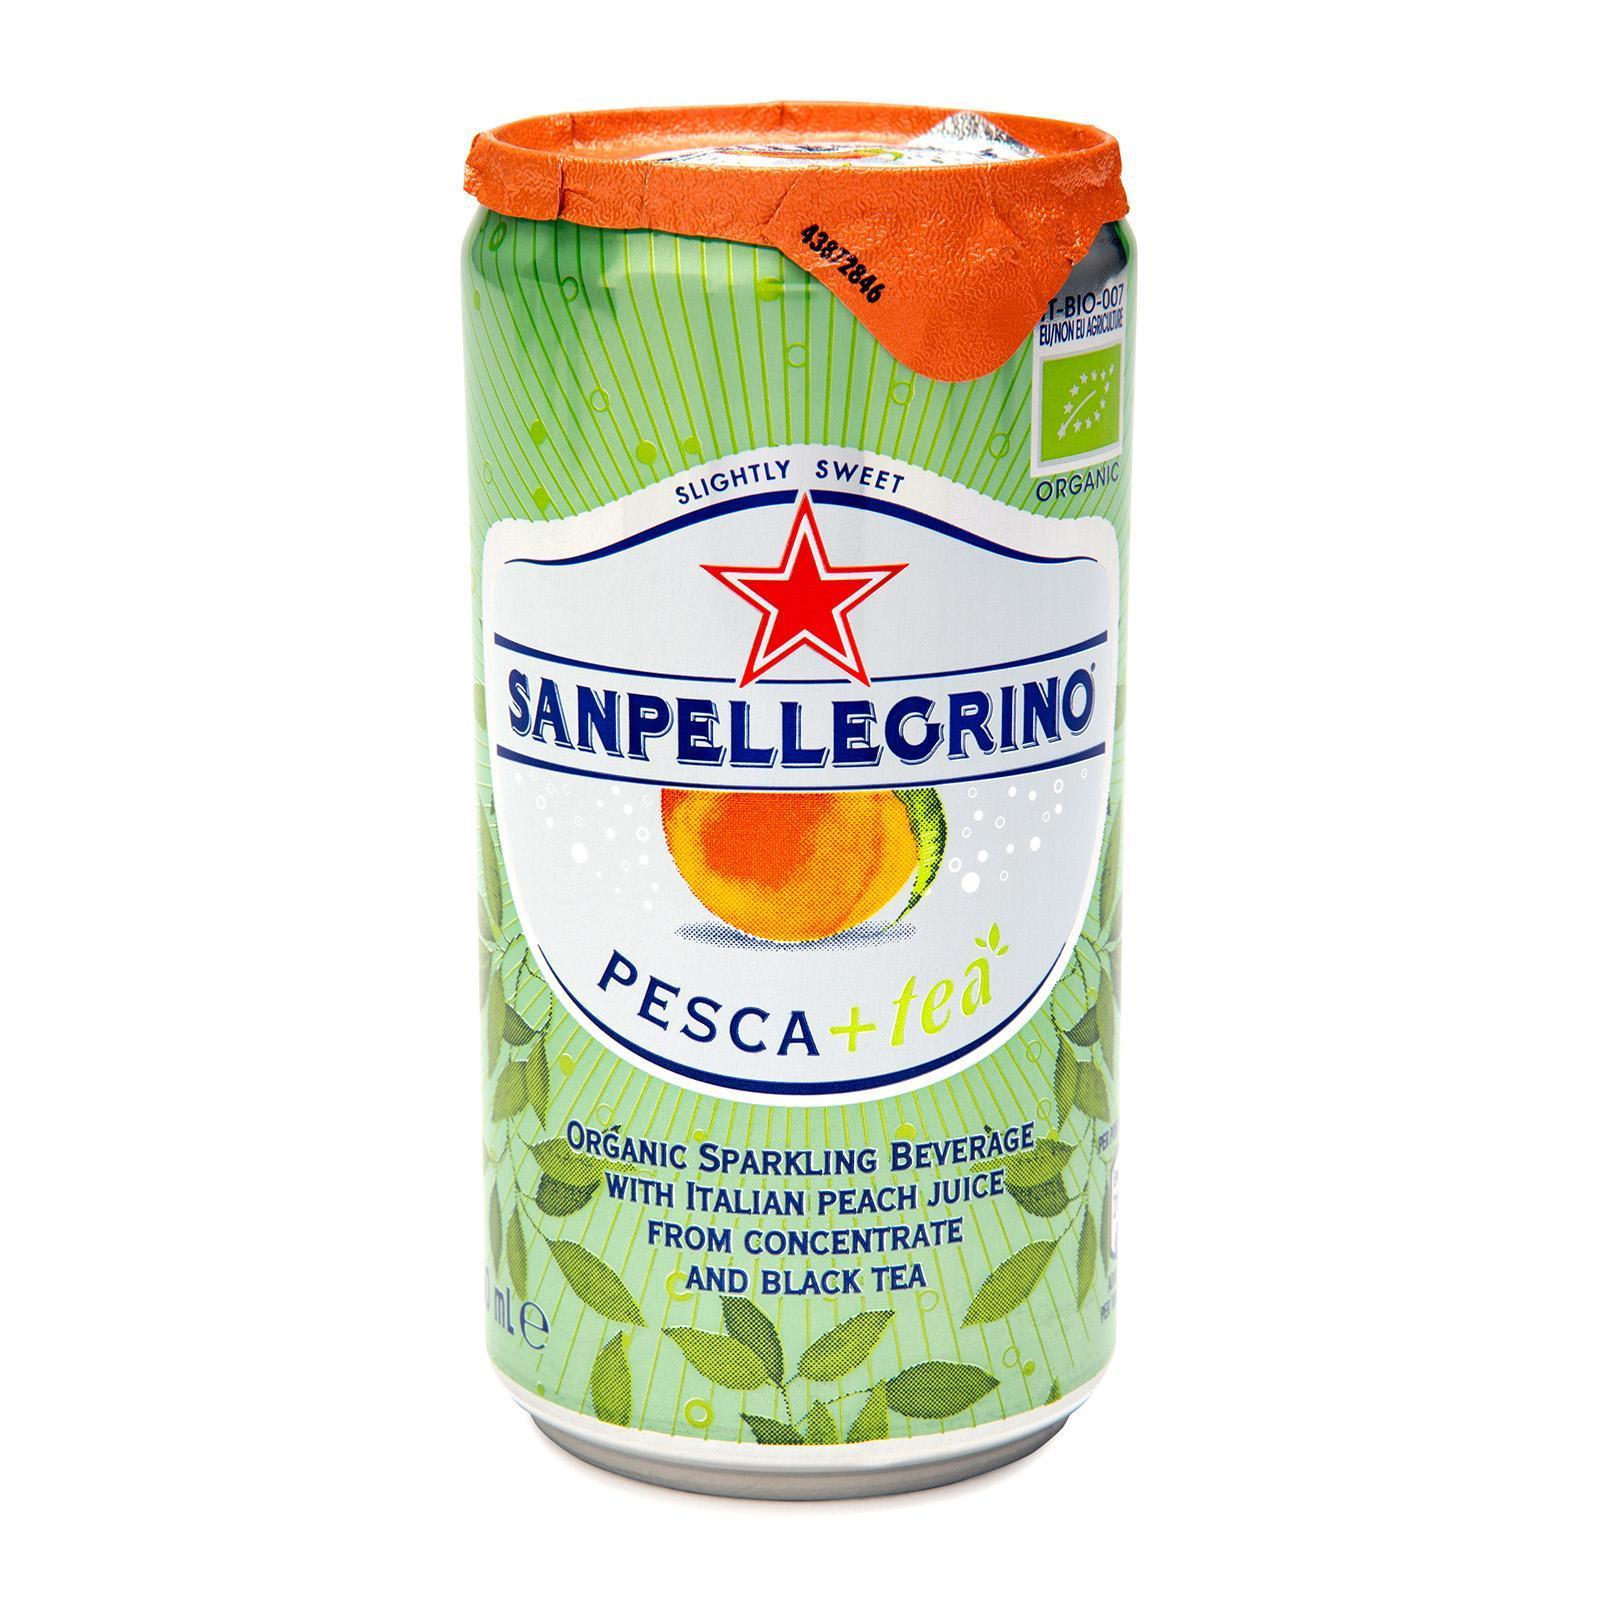 San Pellegrino Pesca+Tea Organic Sparkling Peach Tea